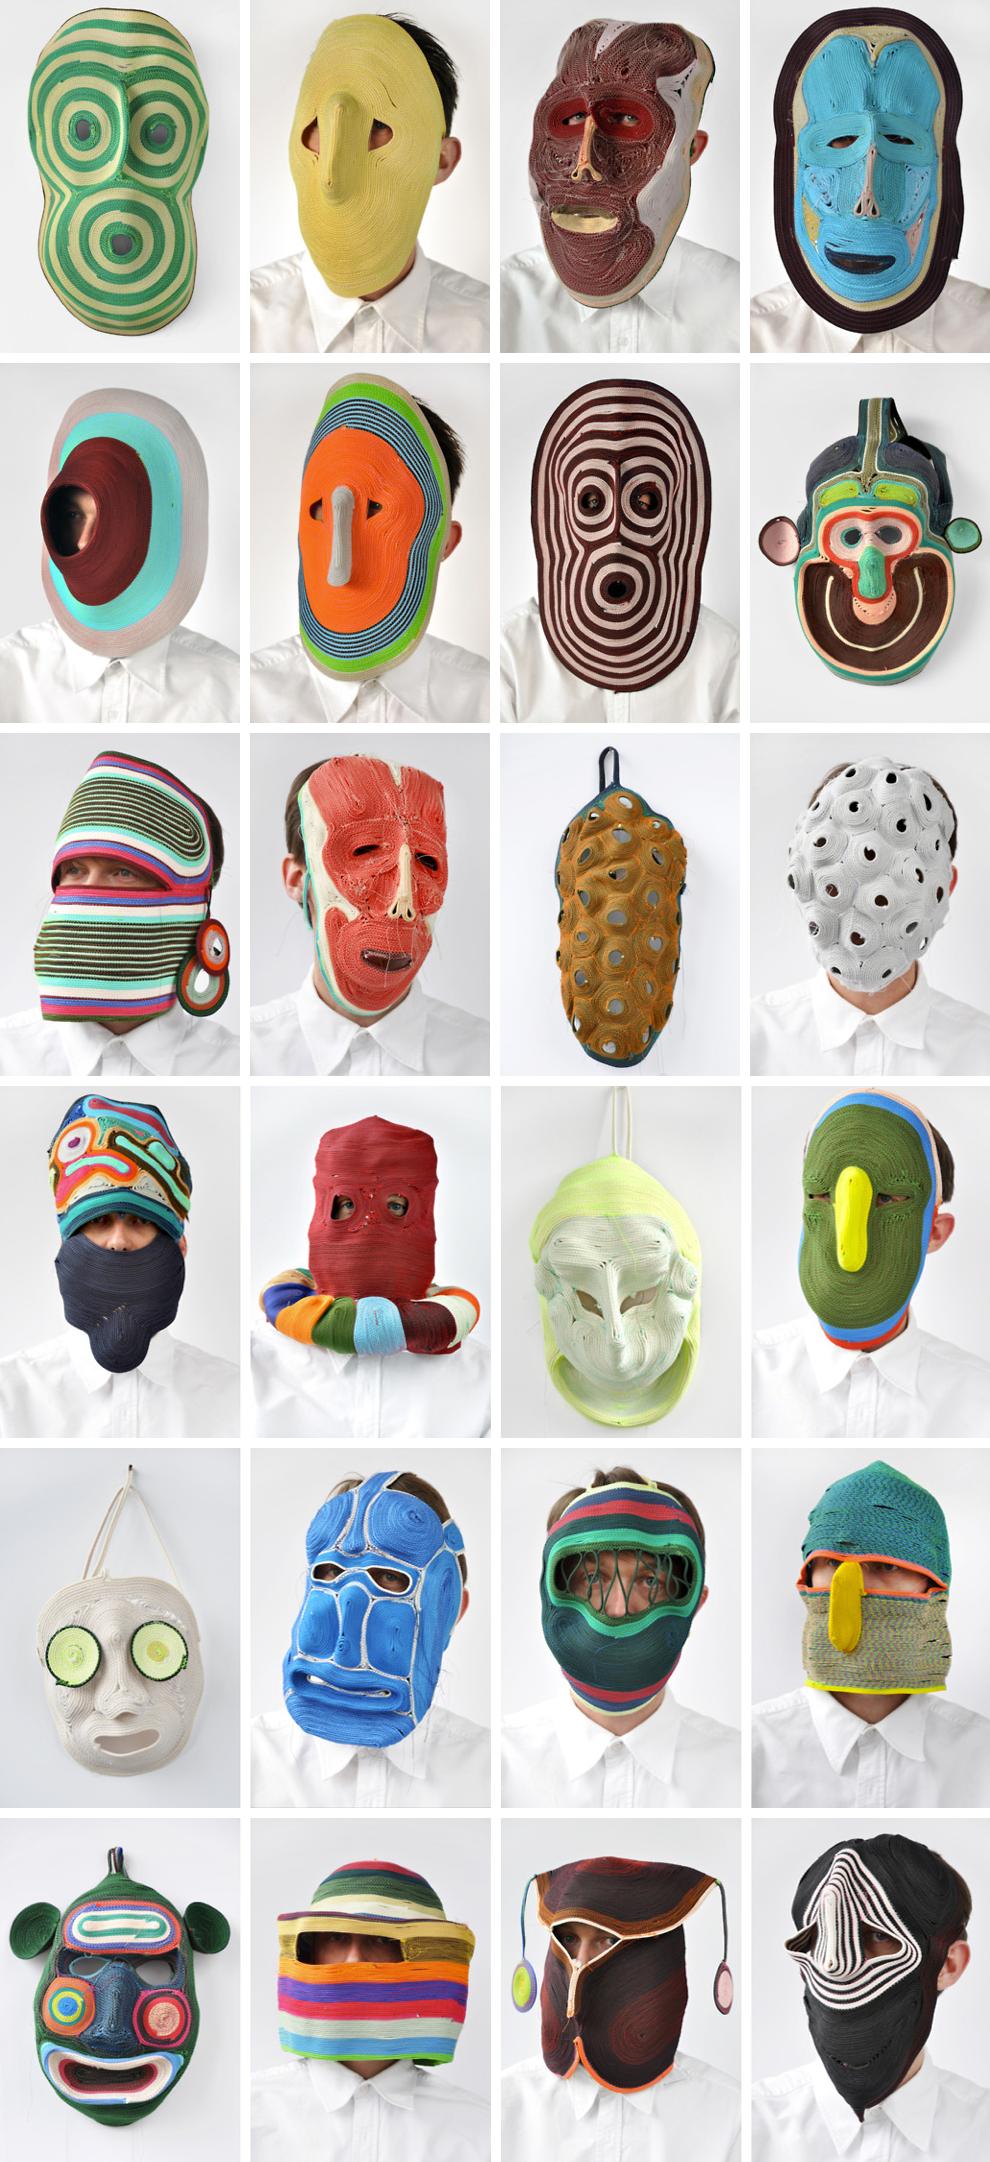 rope-masks-by-BertJan-Pot-wallpaper-wp428854